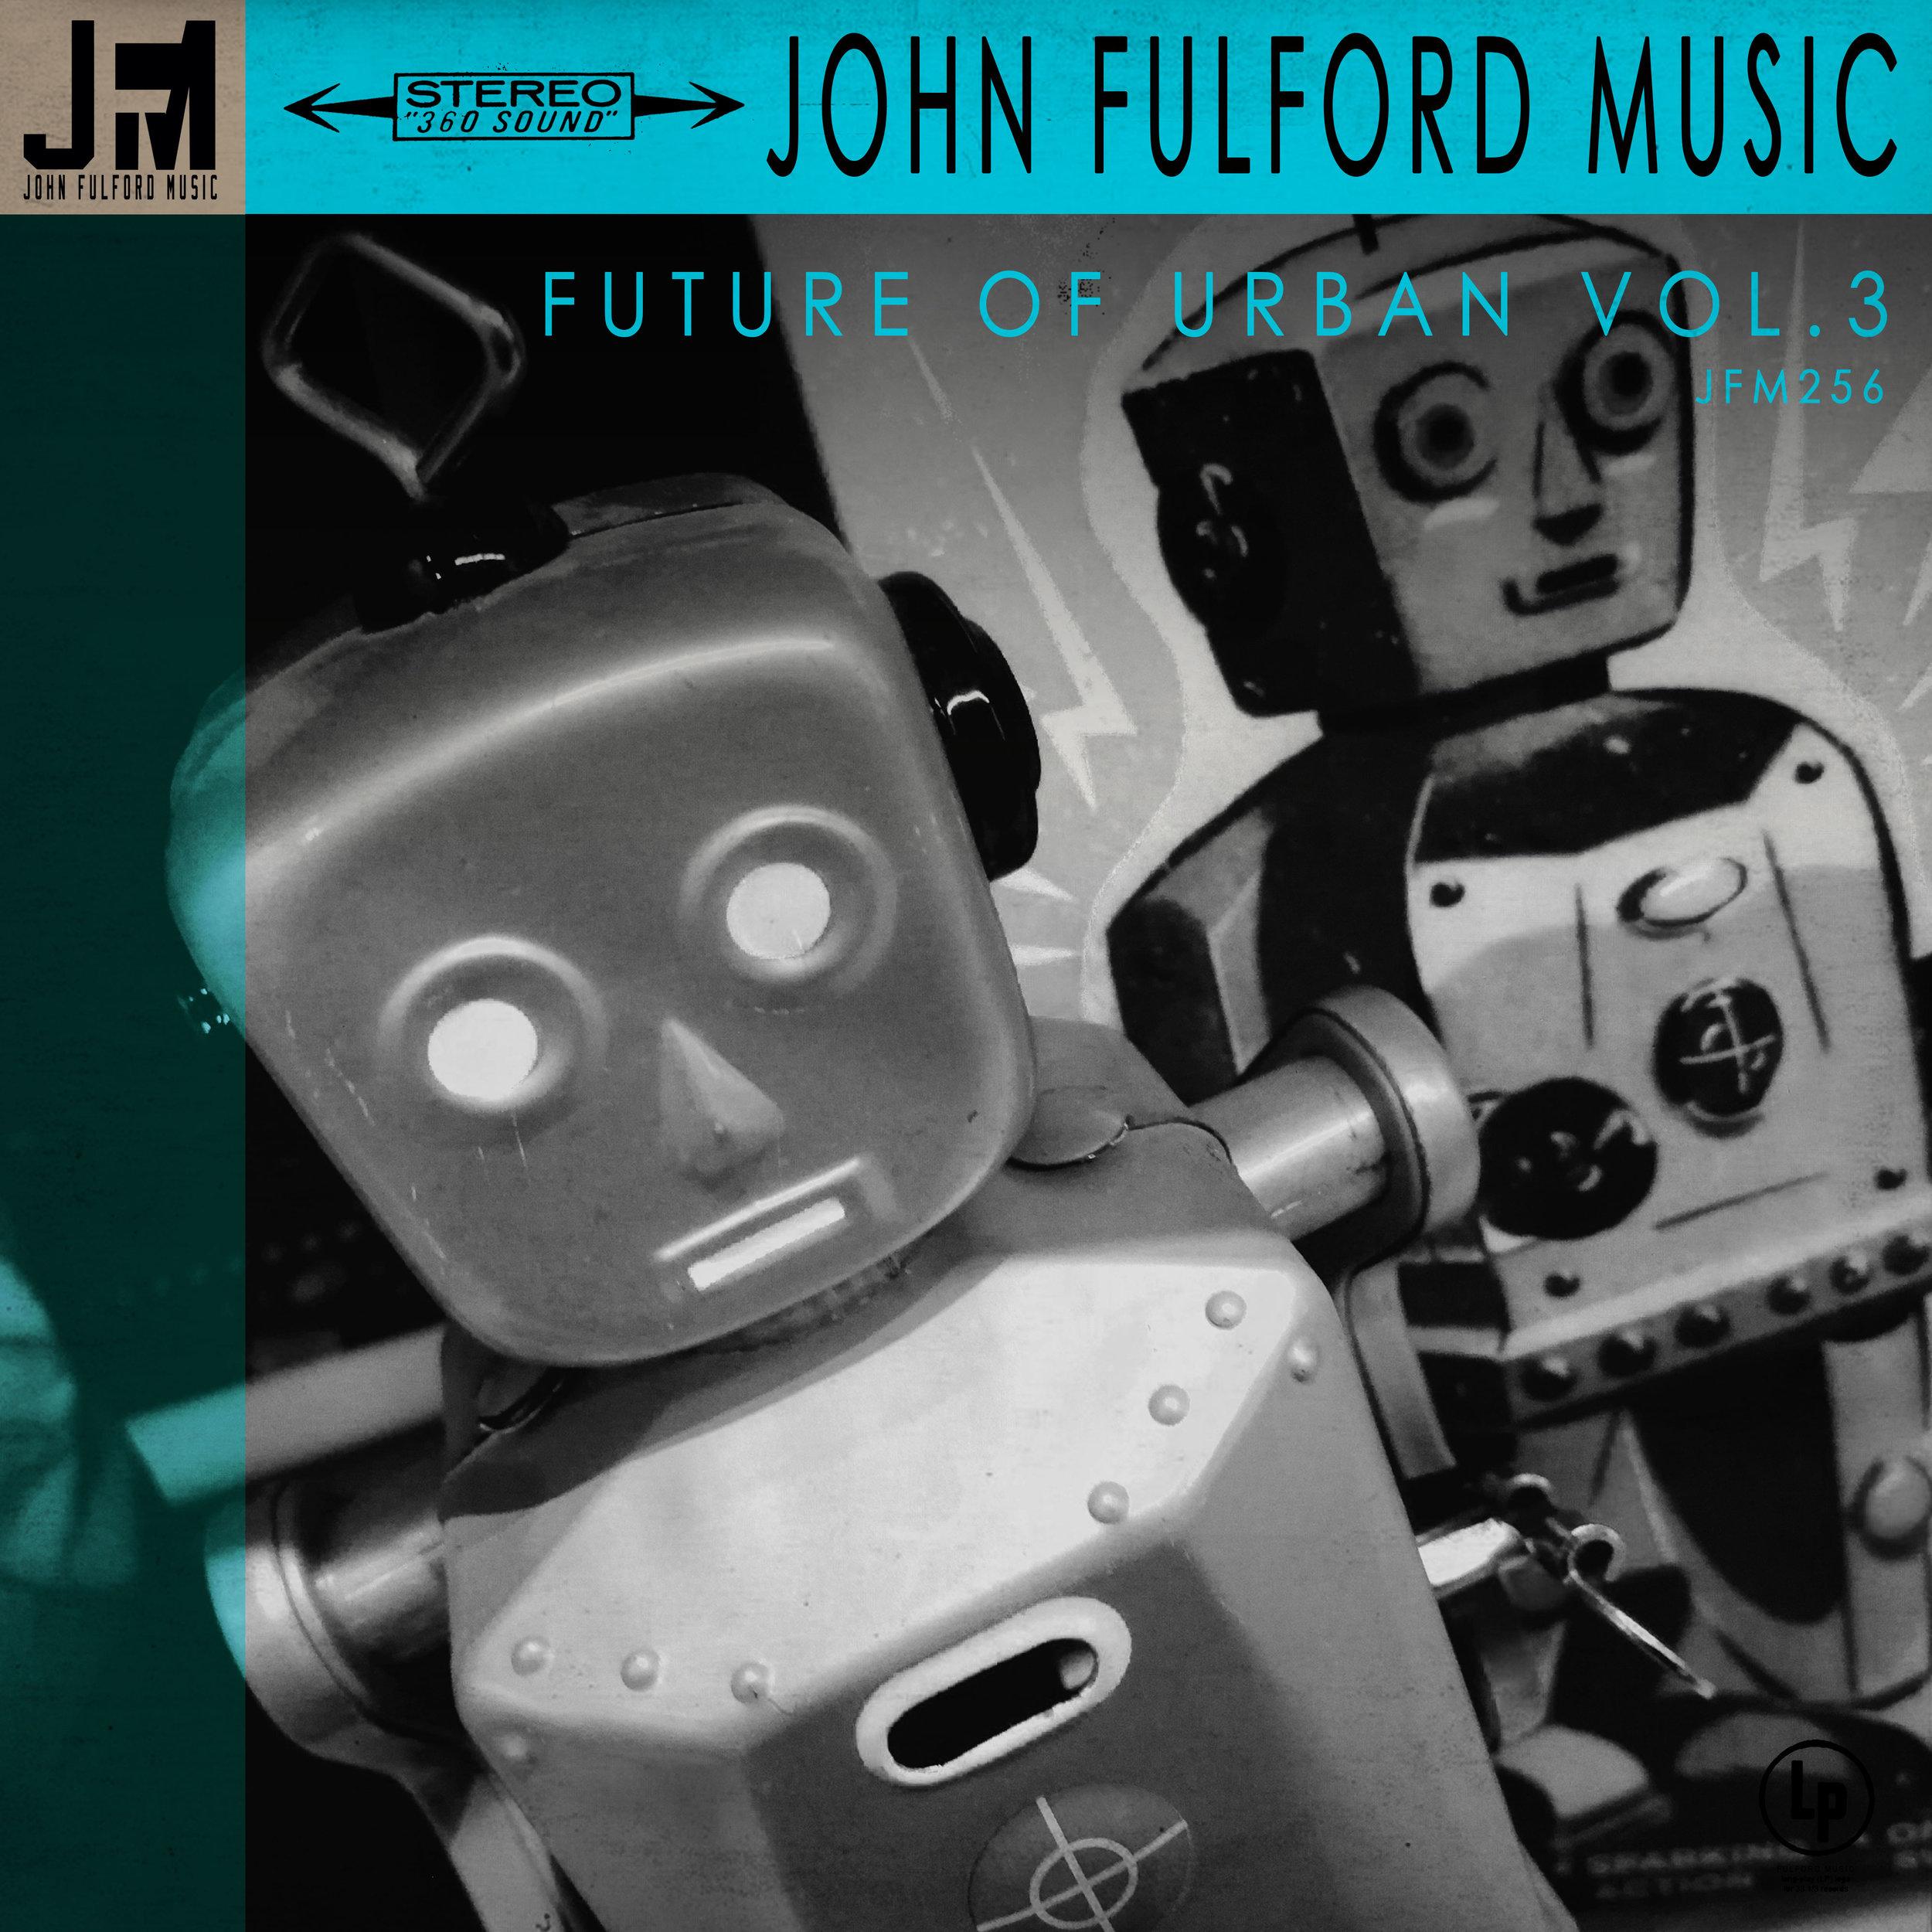 FULFORD-FUTURE-Of-URBAN-3-256.jpg